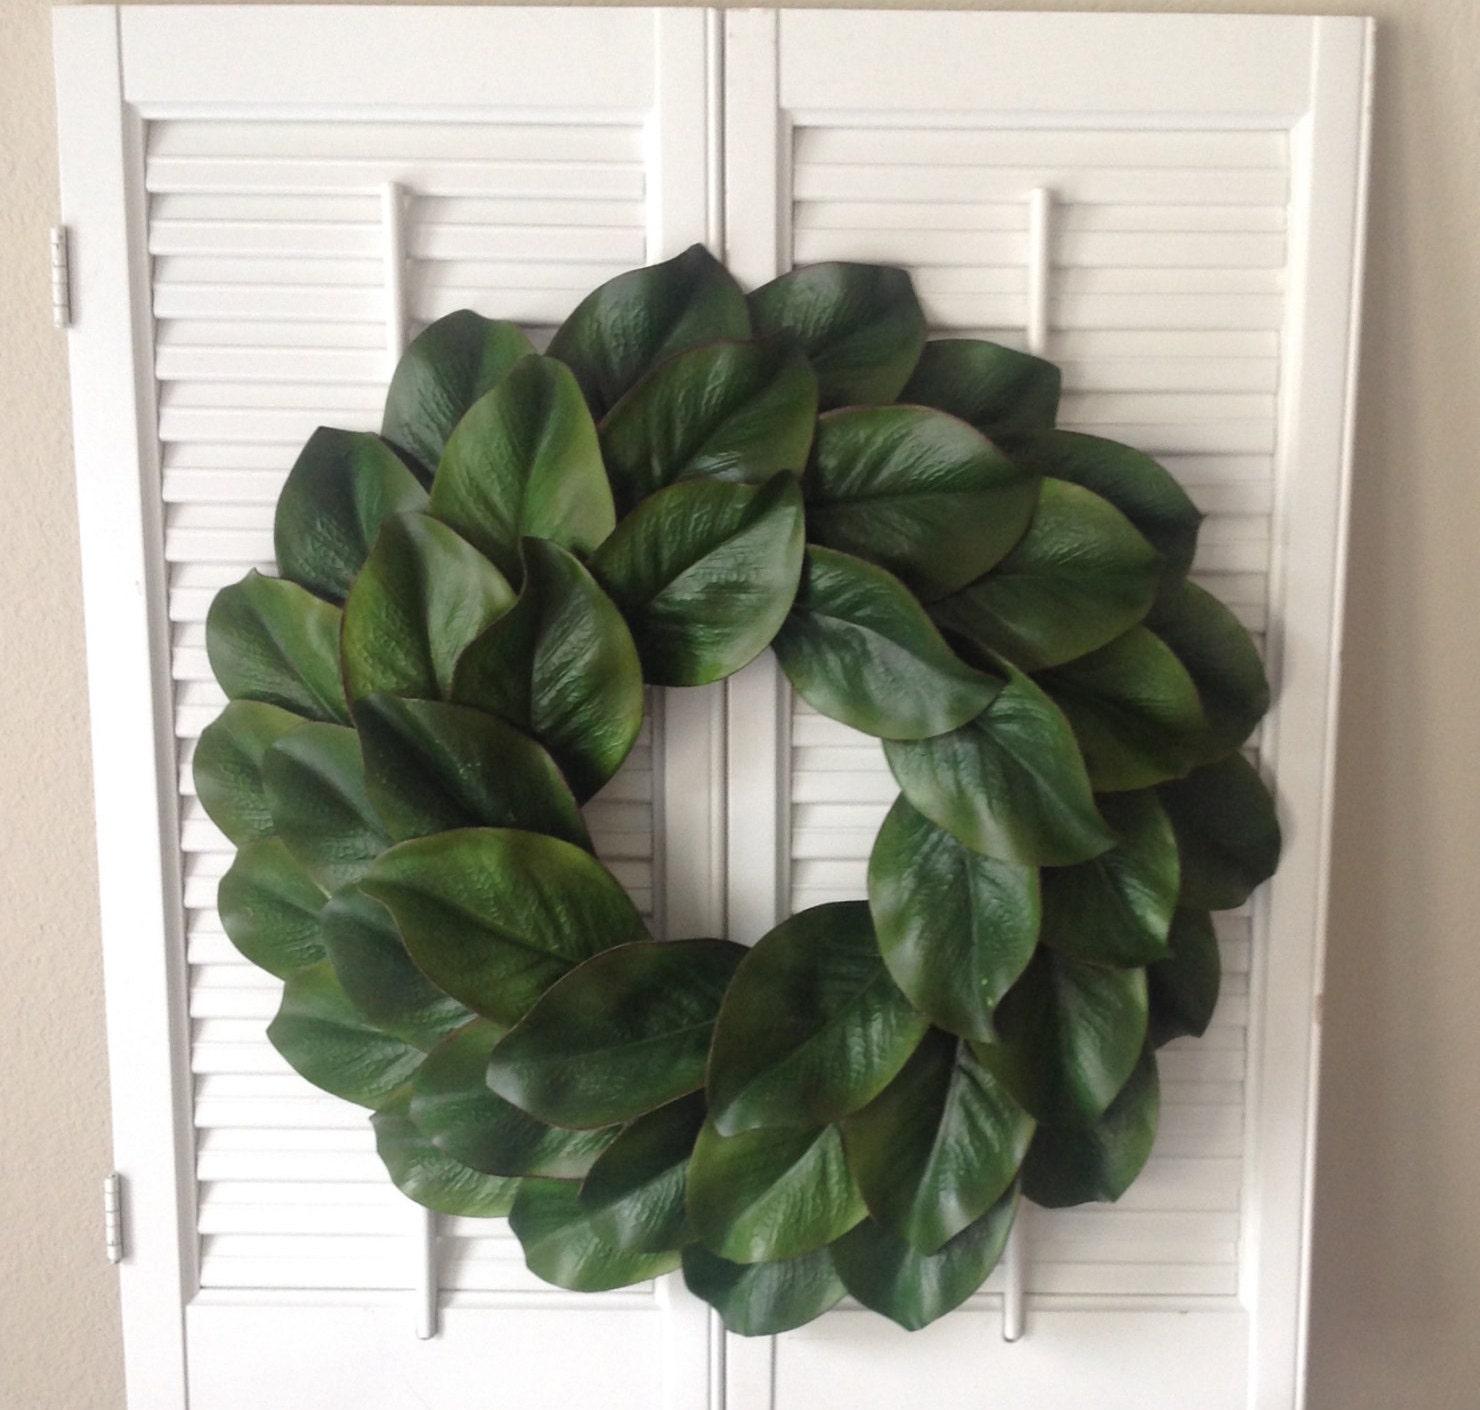 18 magnolia wreath magnolia wreath fixer upper style. Black Bedroom Furniture Sets. Home Design Ideas